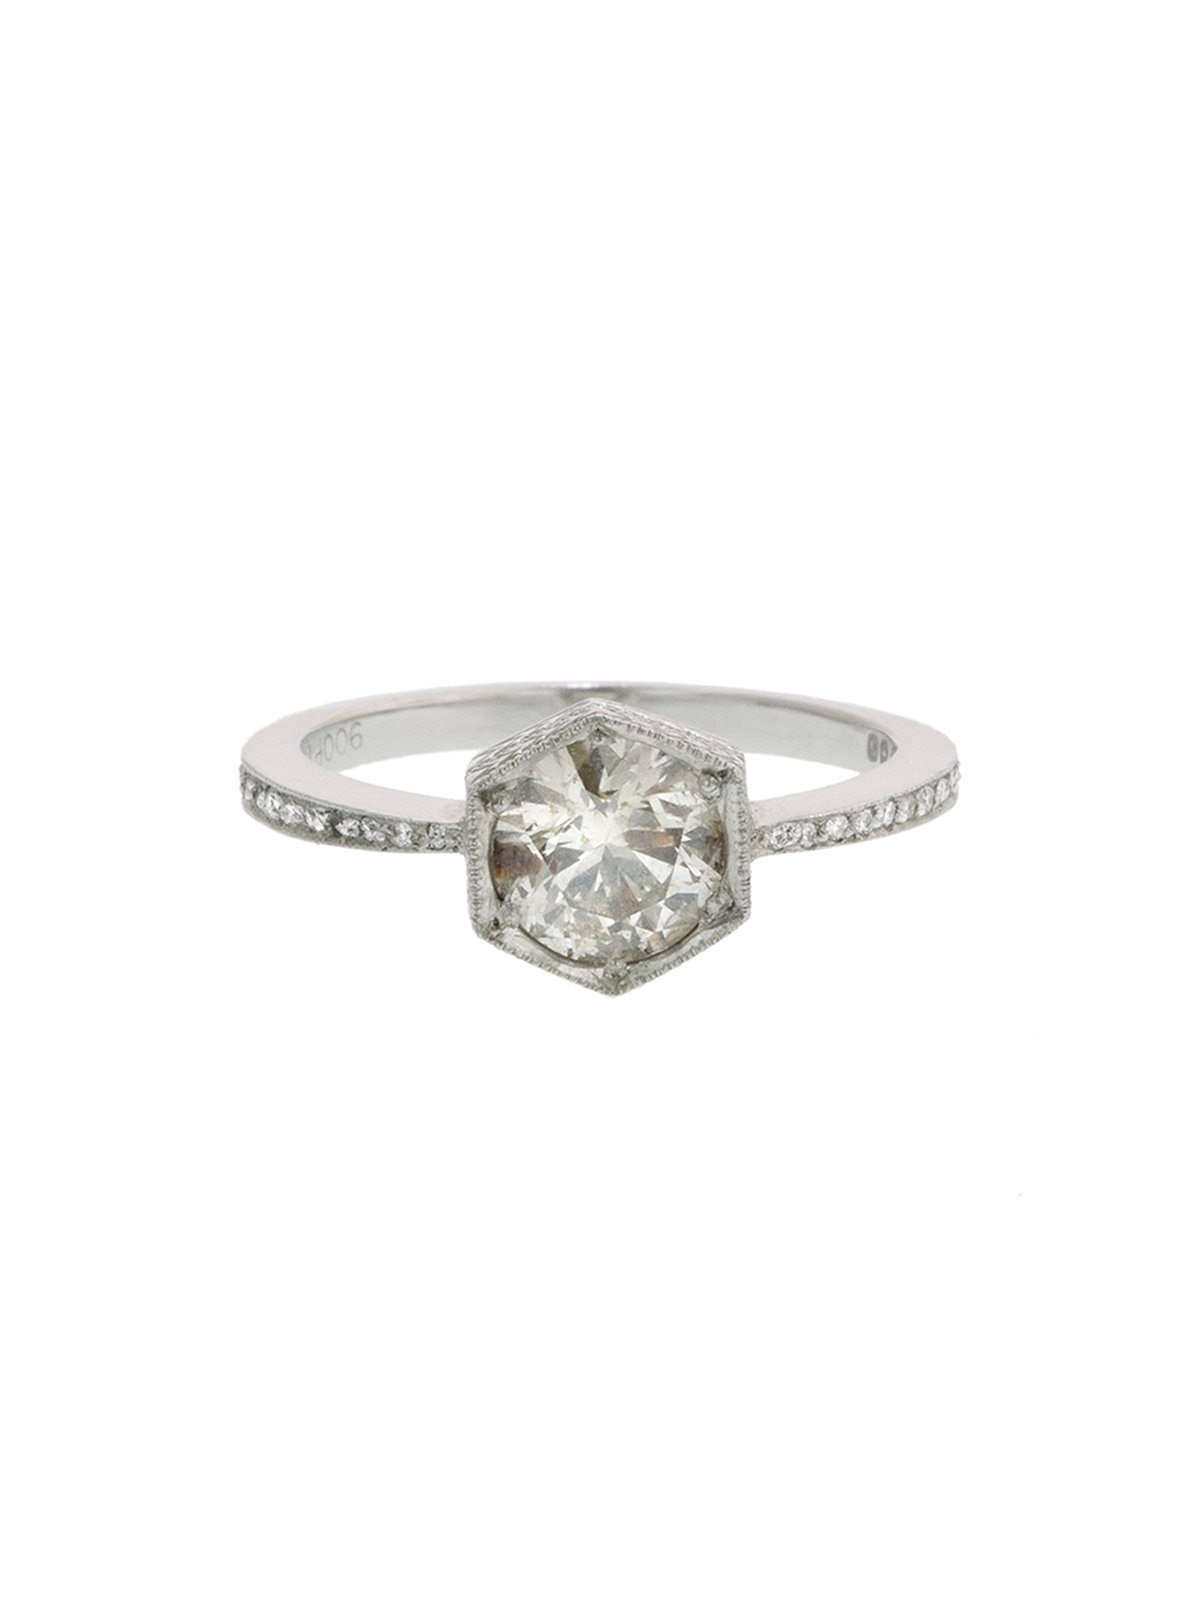 Black and White Diamond Hexagonal Bezel Platinum Ring